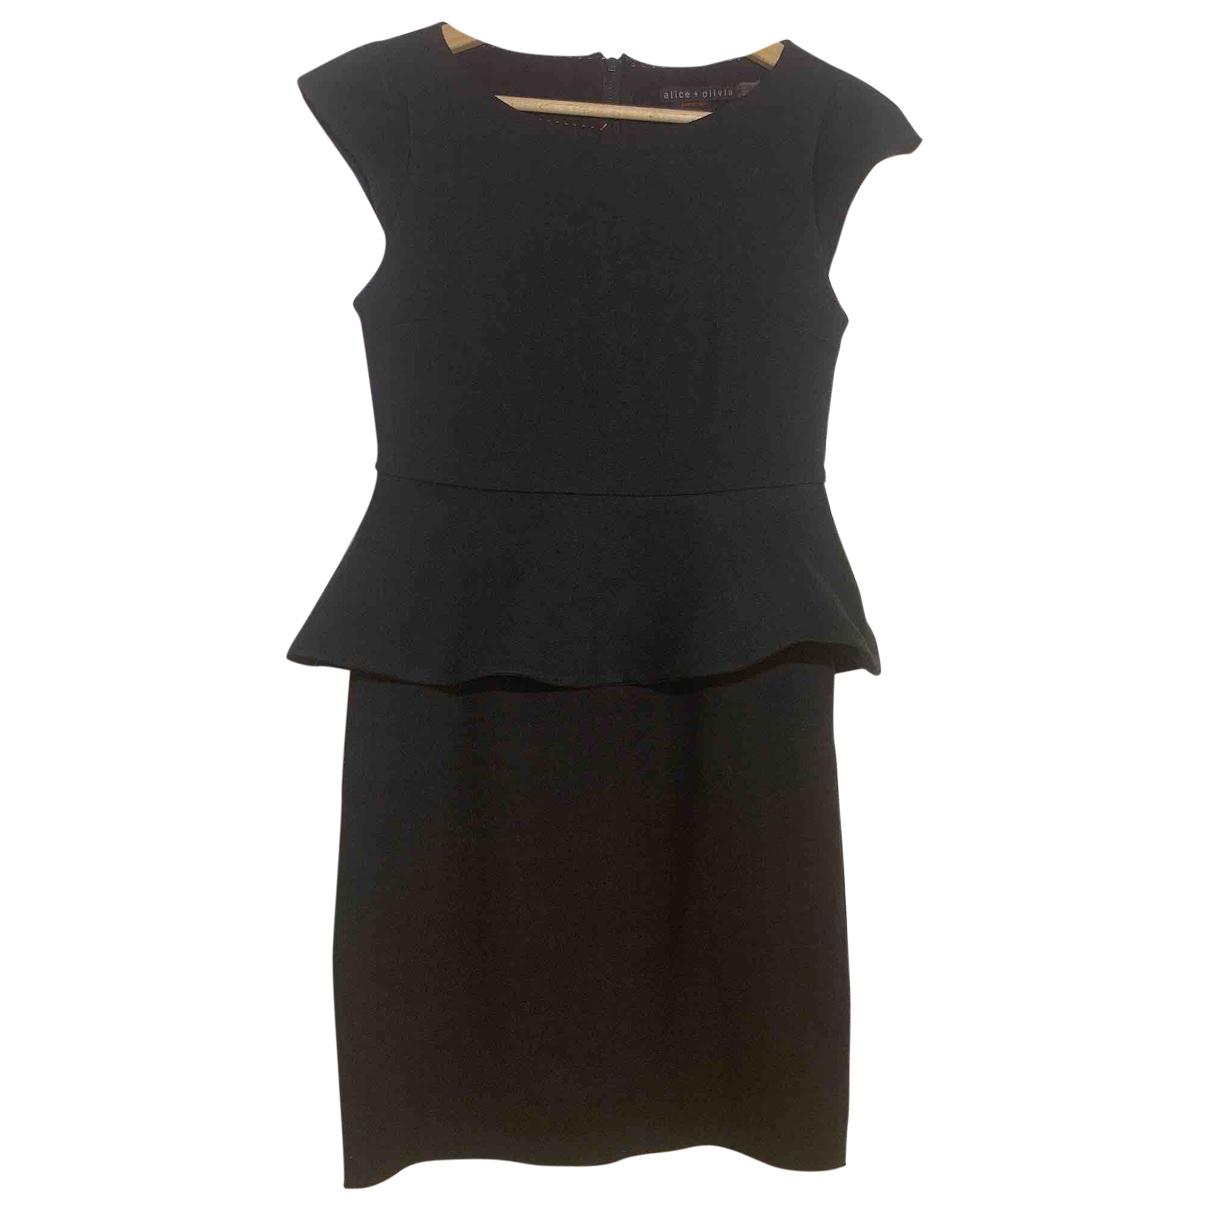 Alice & Olivia - Robe   pour femme en coton - elasthane - noir